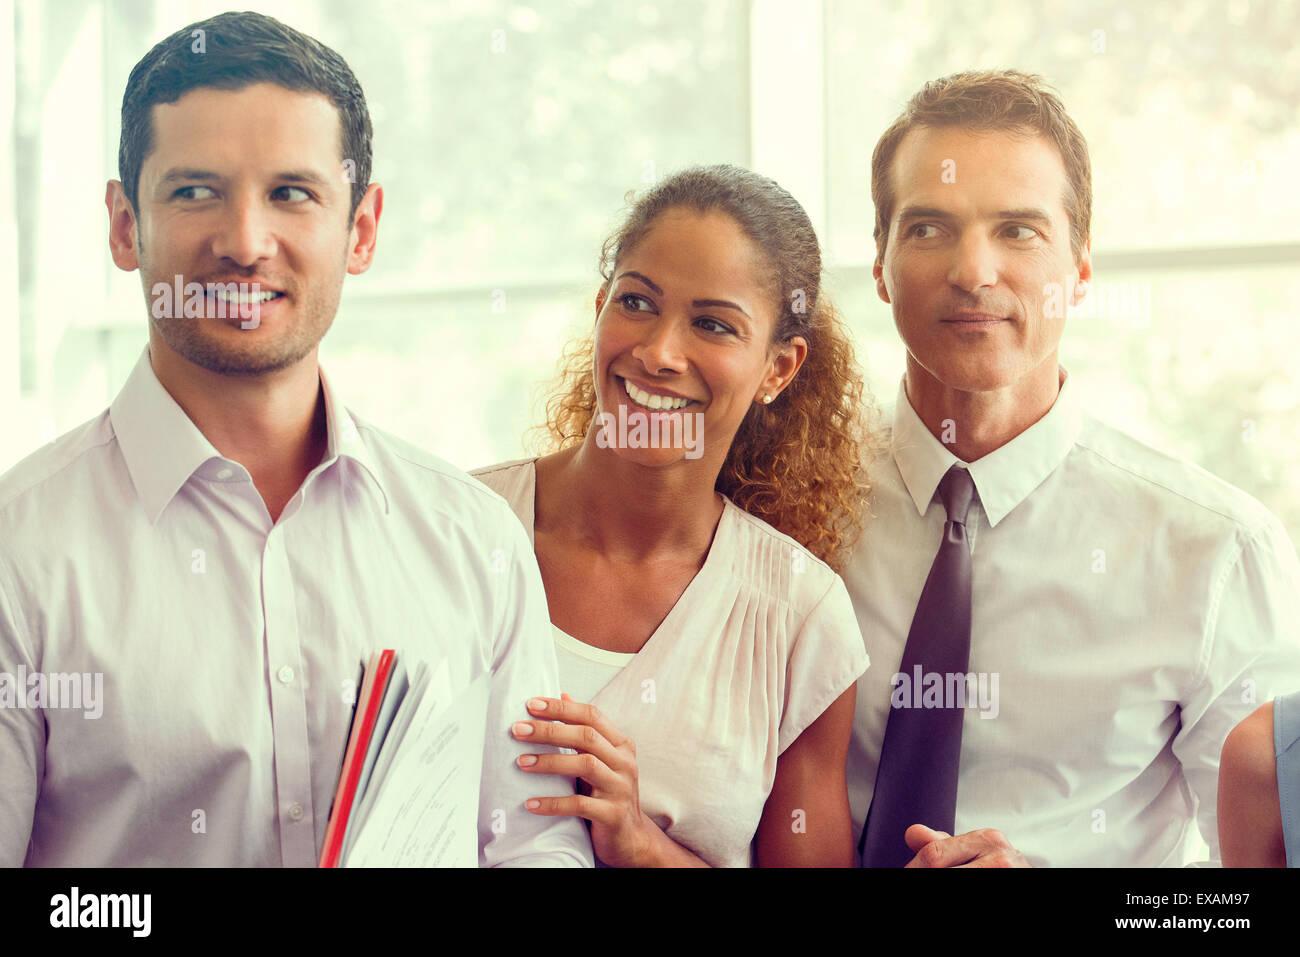 Geschäftspartnern teilen unbeschwerten Augenblick zusammen Stockbild